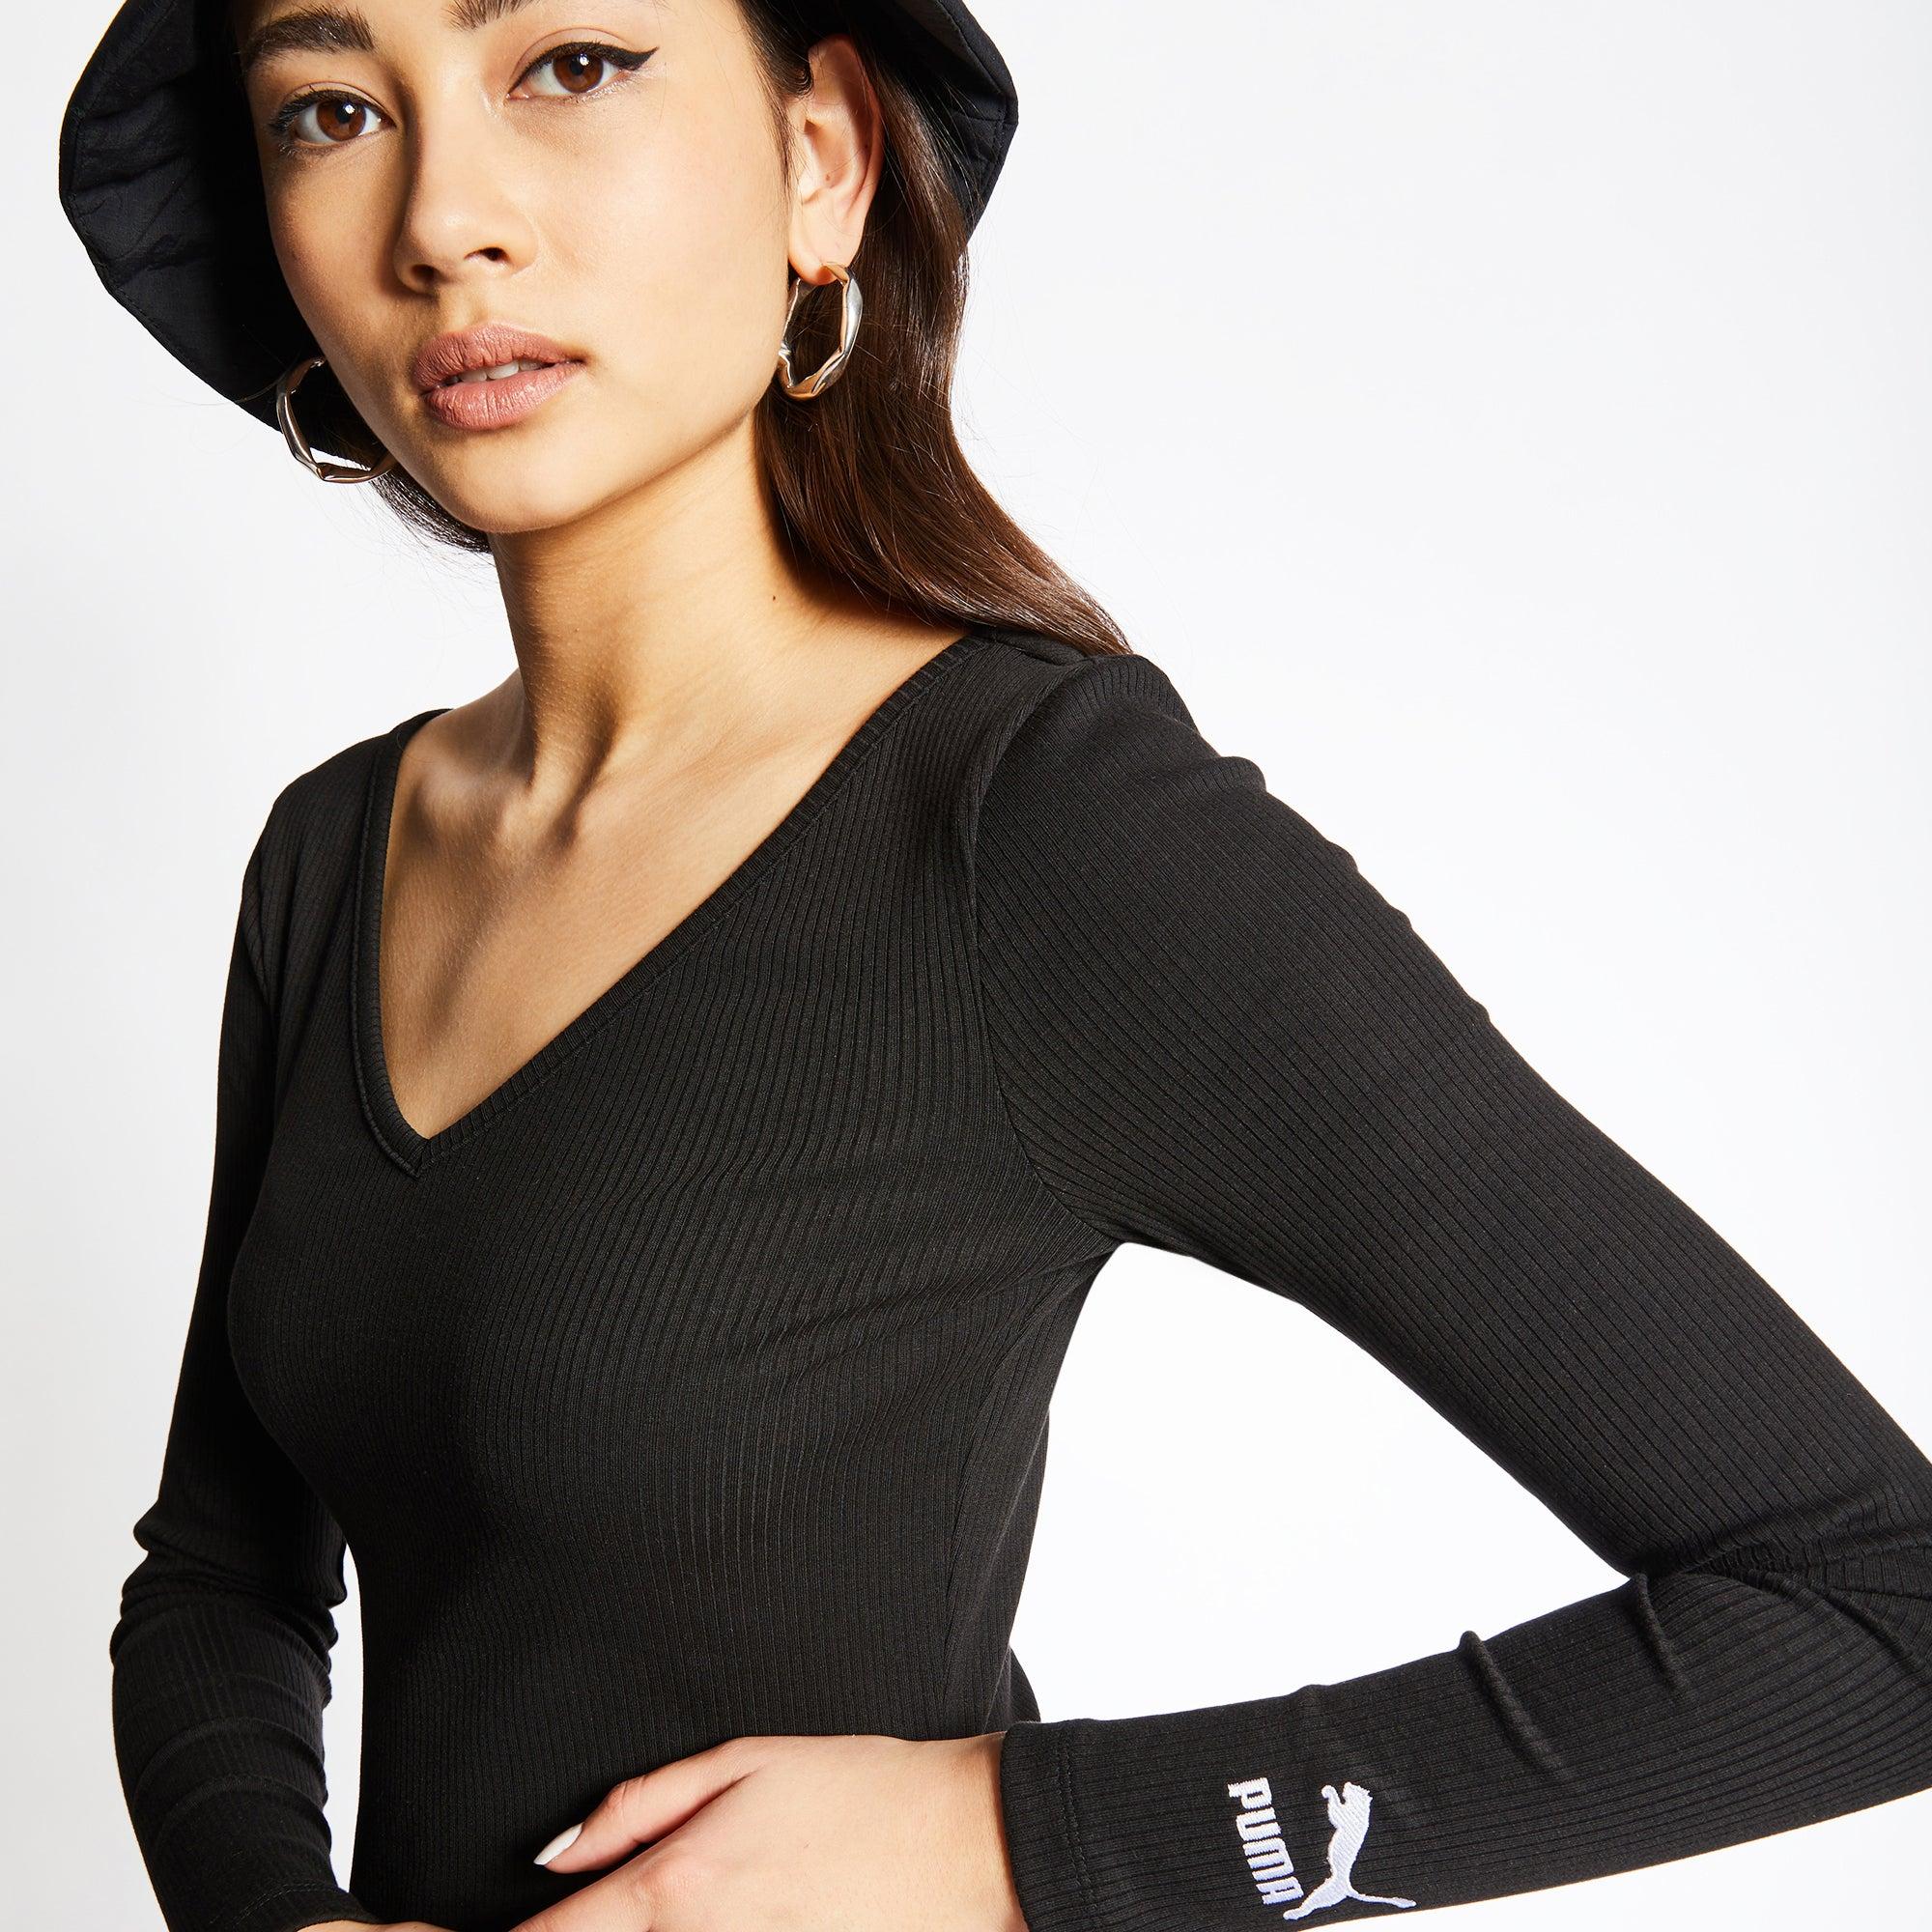 Puma Classic Rib Bodycon - Women Dresses - Image 1 of 4 Enlarged Image